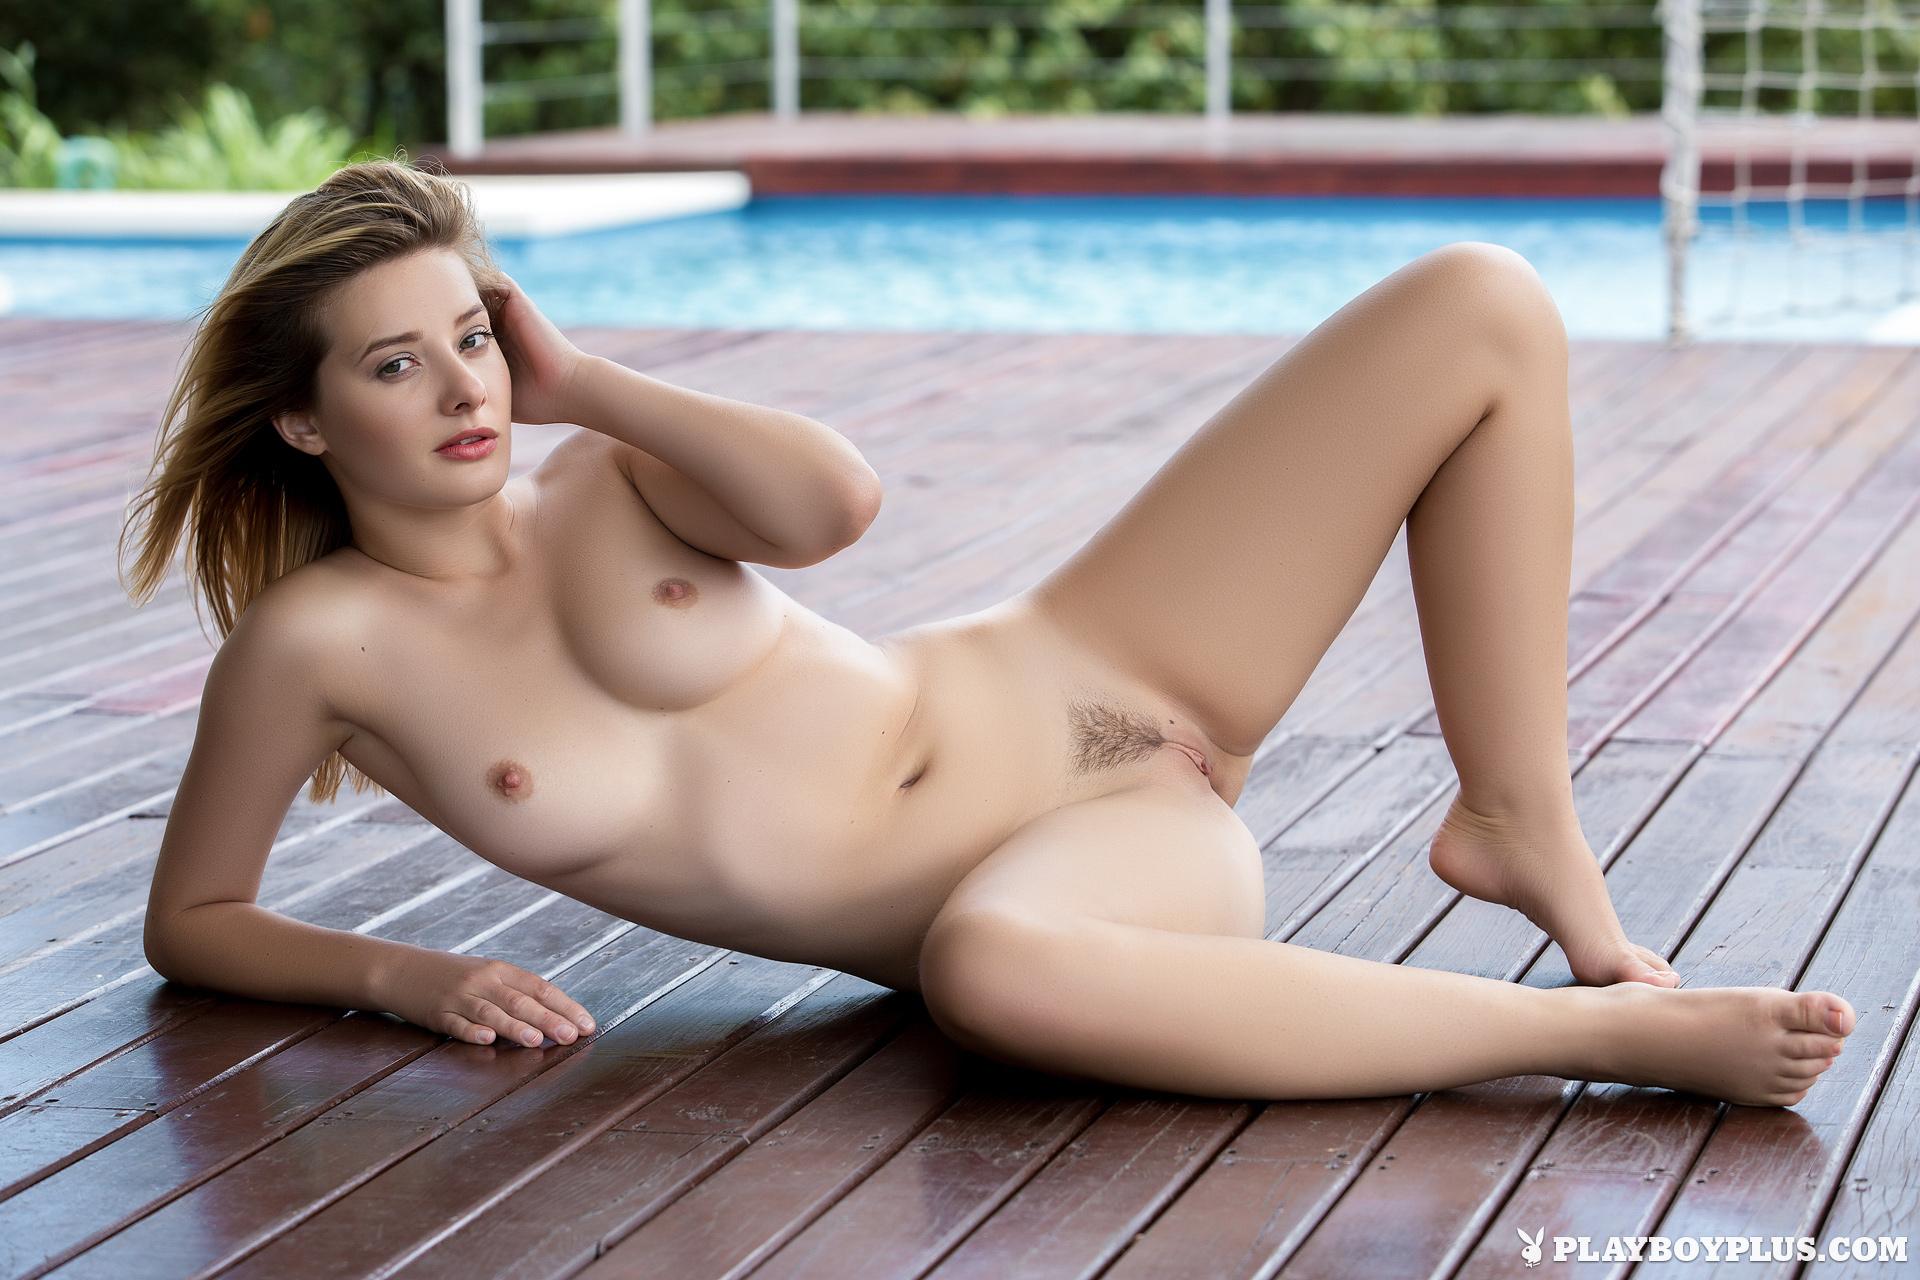 Big boob mexican girls nude